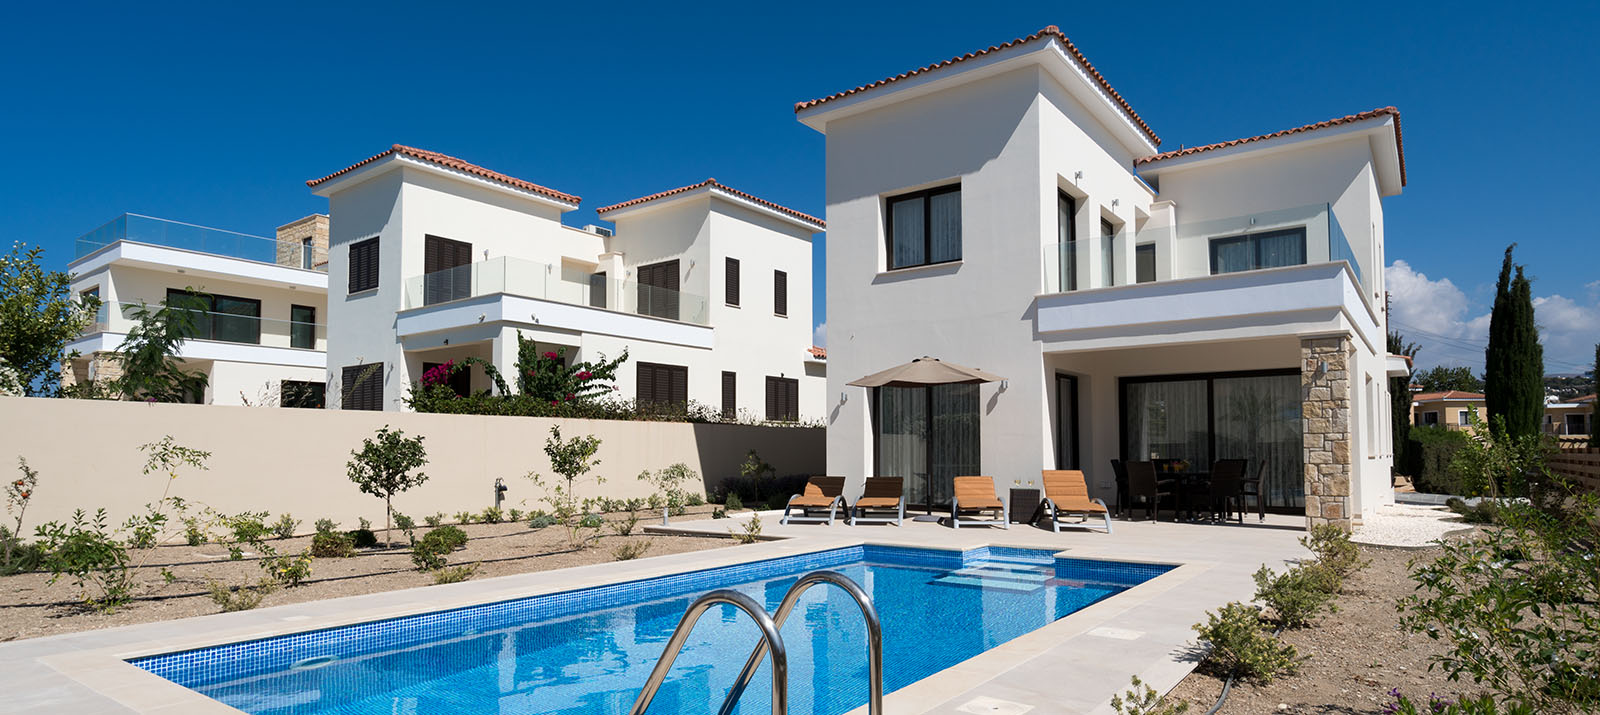 Cyprus Holiday Villa 519344